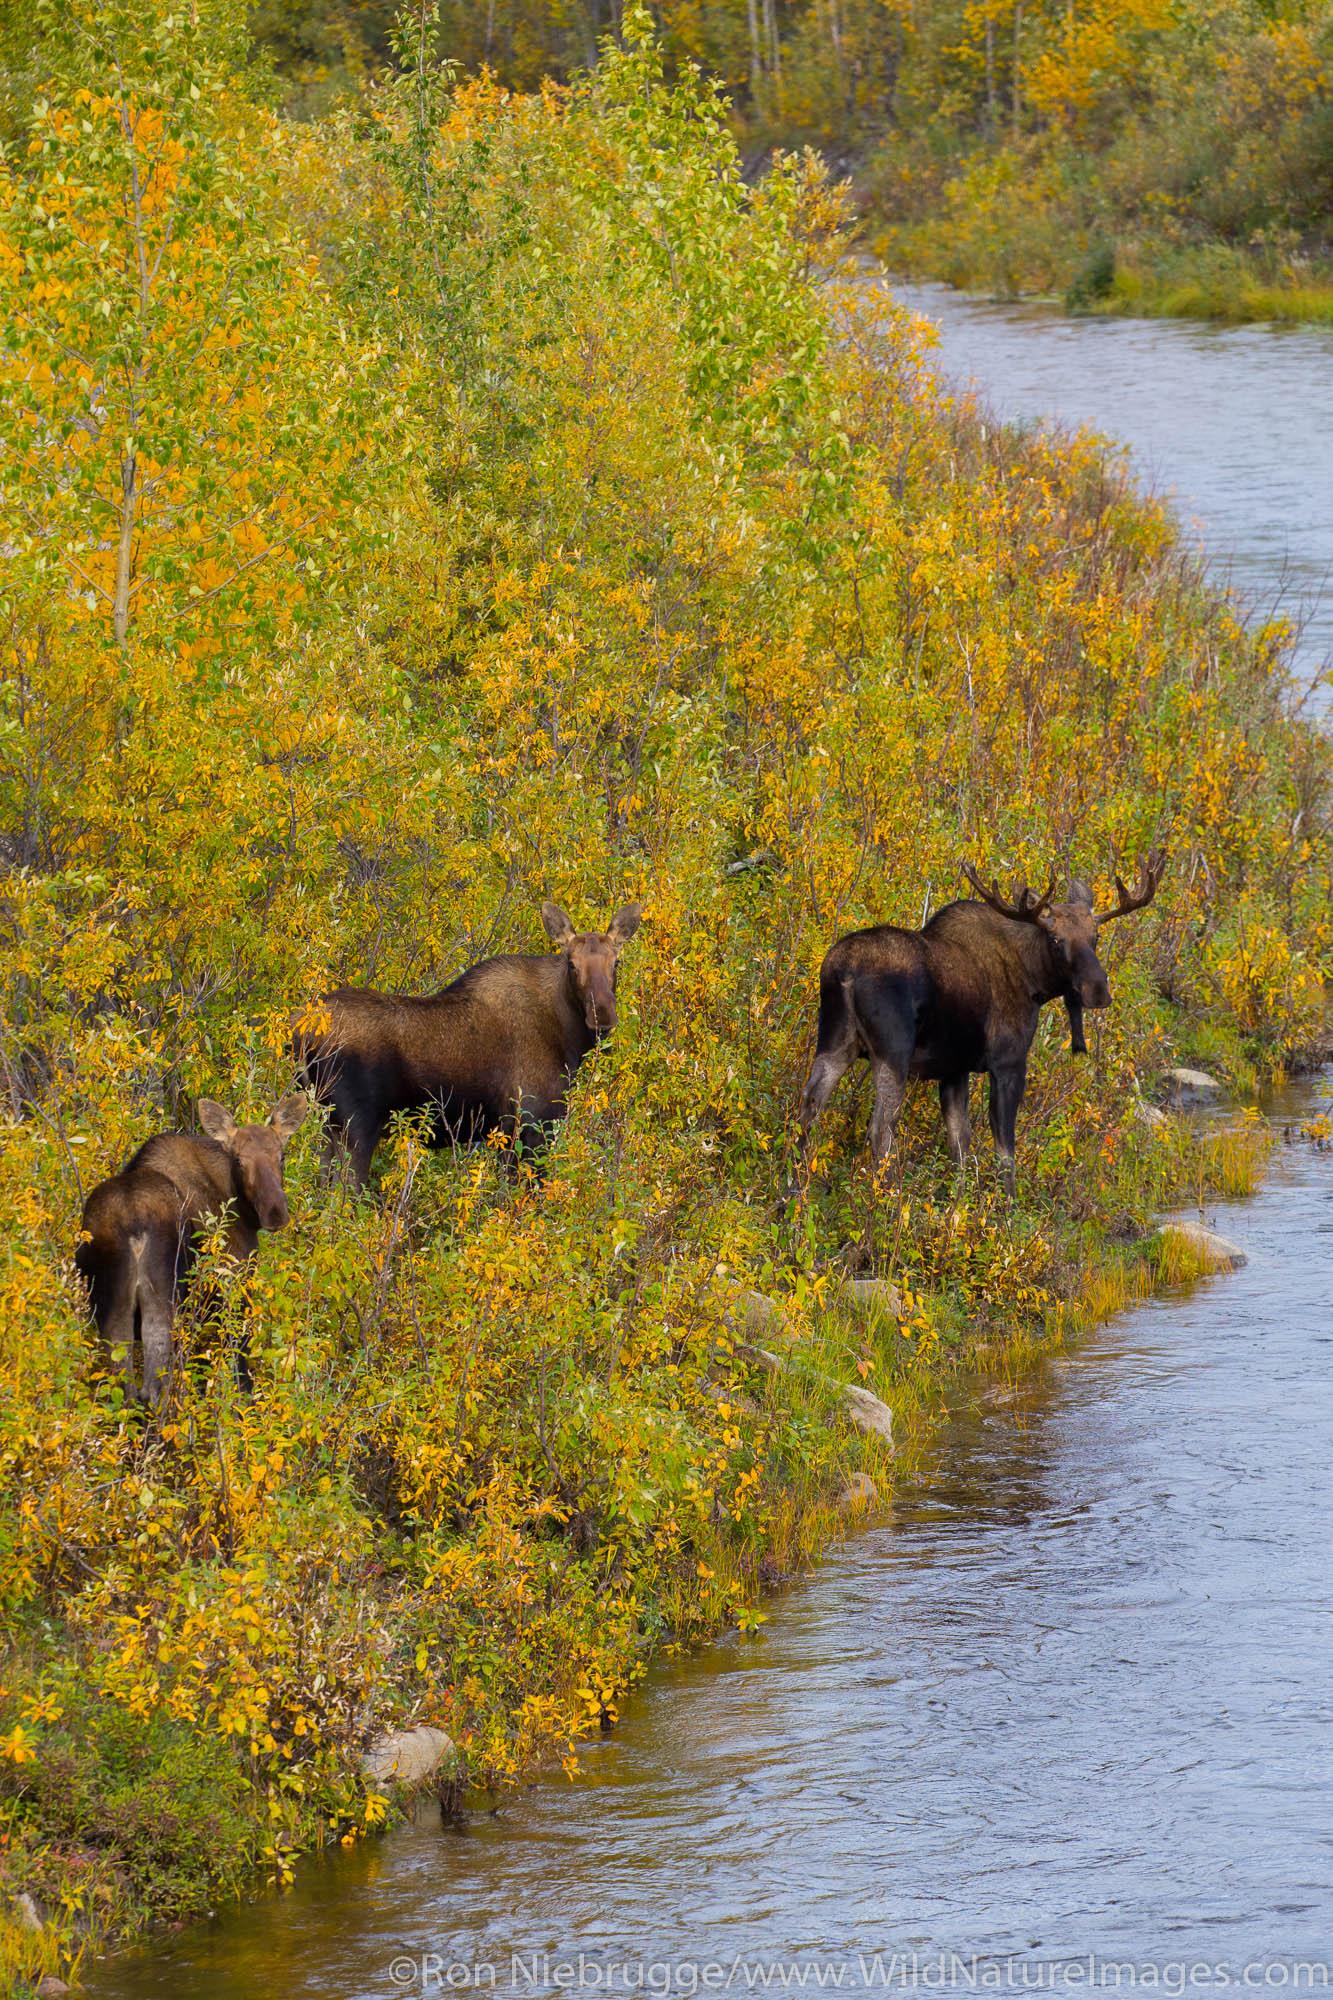 Moose in the autumn colors along the Dalton Highway Alaska.